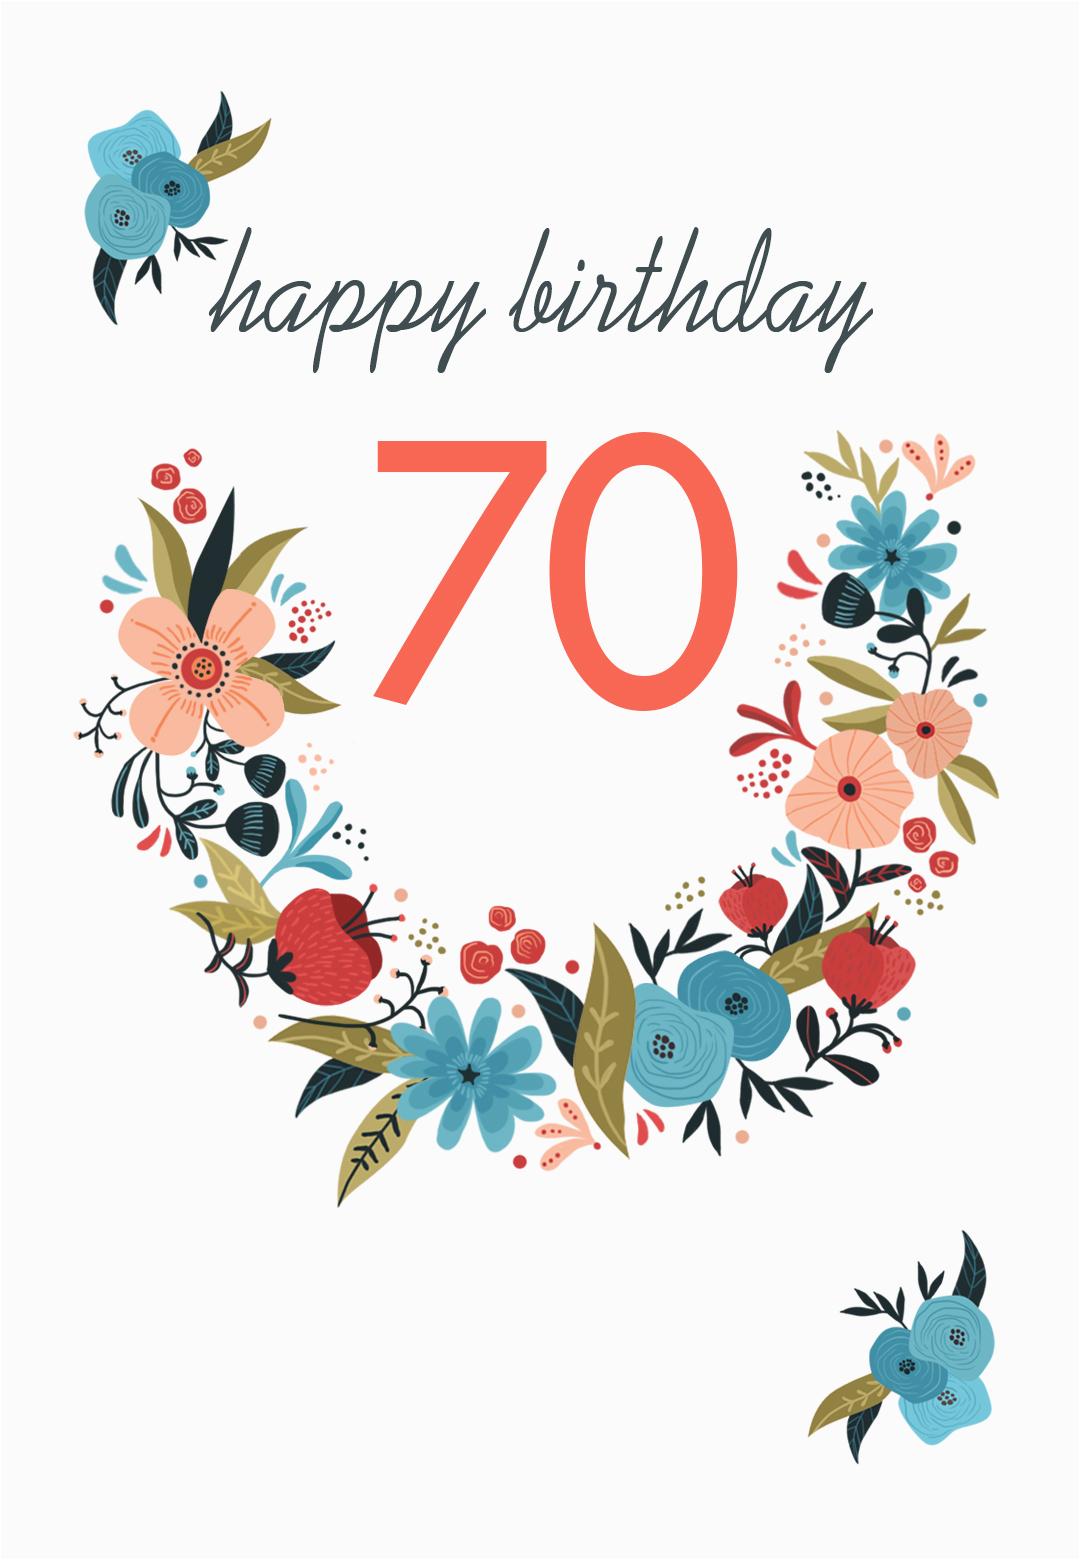 Free Printable 70th Birthday Cards Floral 70 Free Birthday Card Greetings island